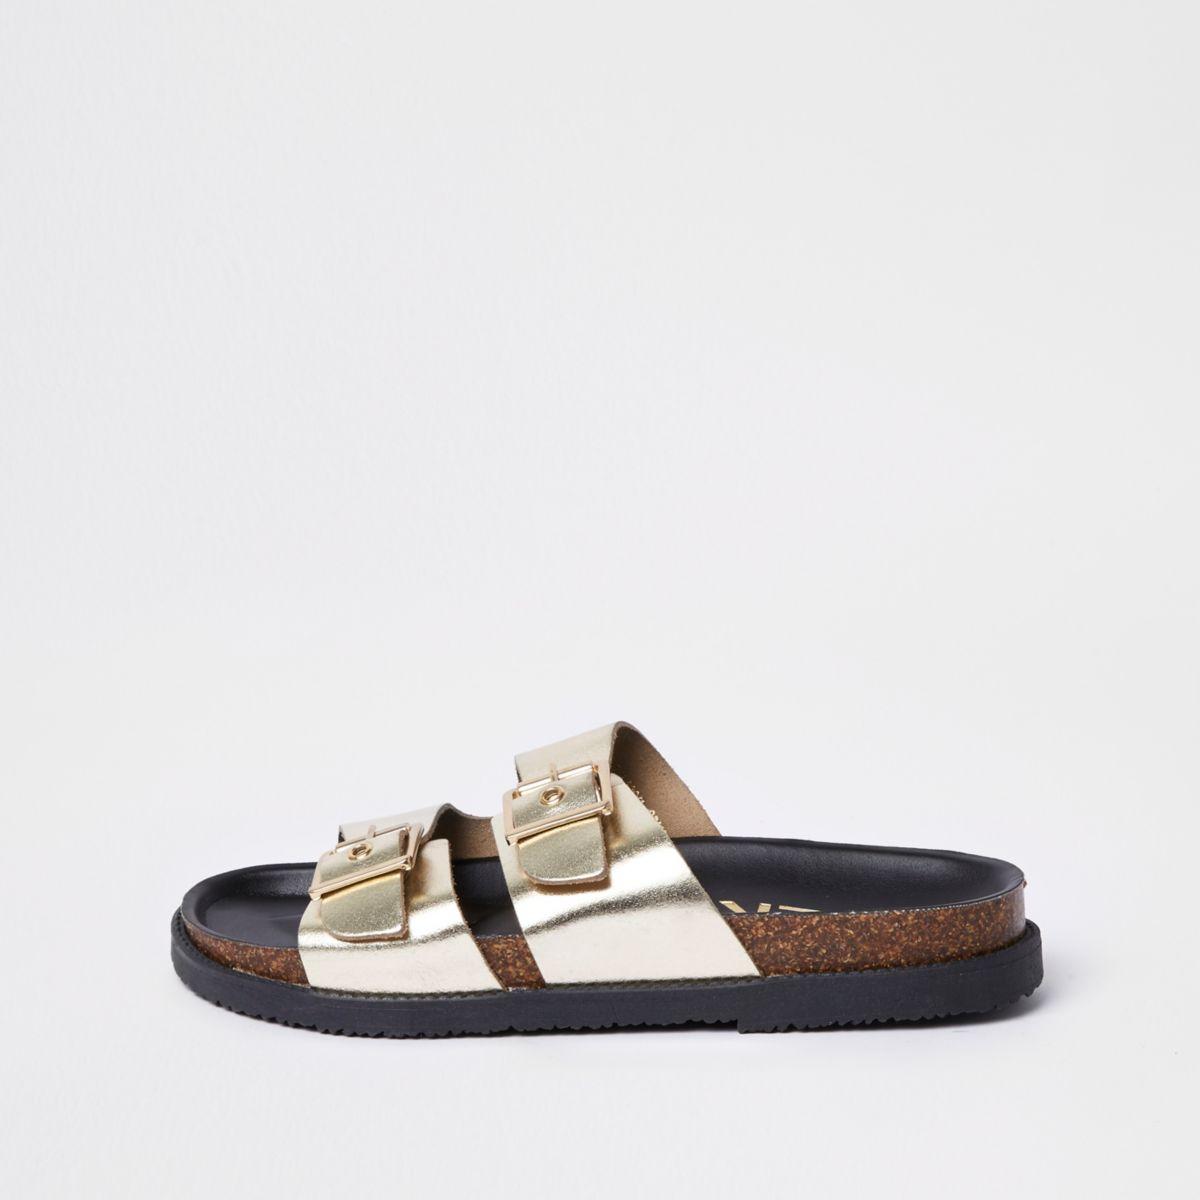 Gold double buckle mule sandals